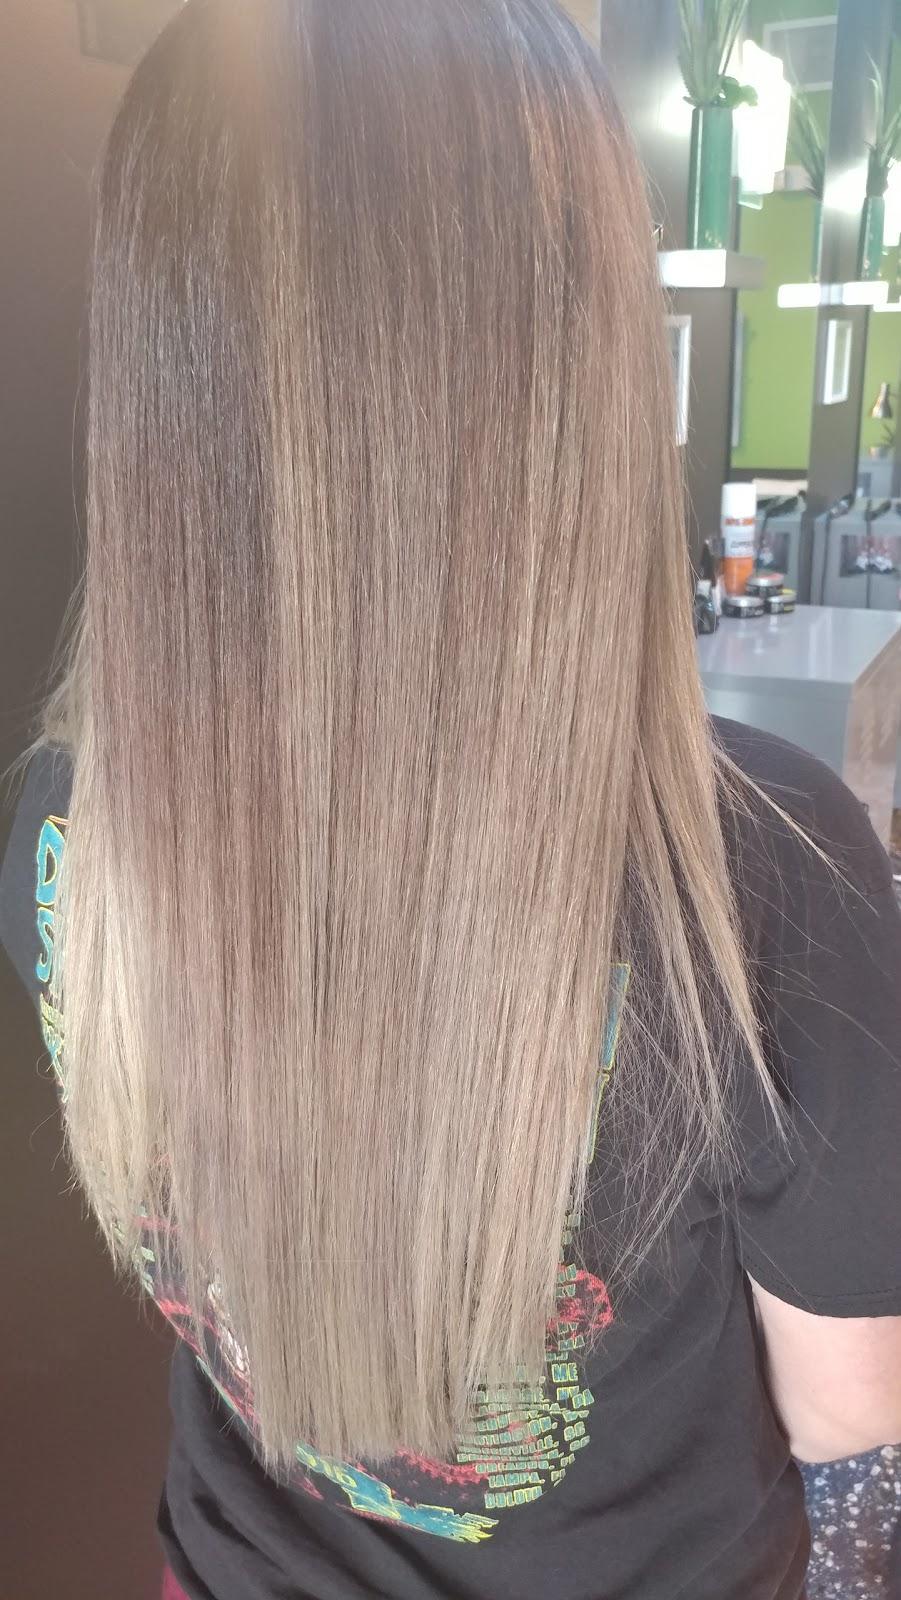 Evolve Simply Beauty - hair care    Photo 10 of 10   Address: 4590 N Maize Rd #8, Maize, KS 67101, USA   Phone: (316) 927-2400